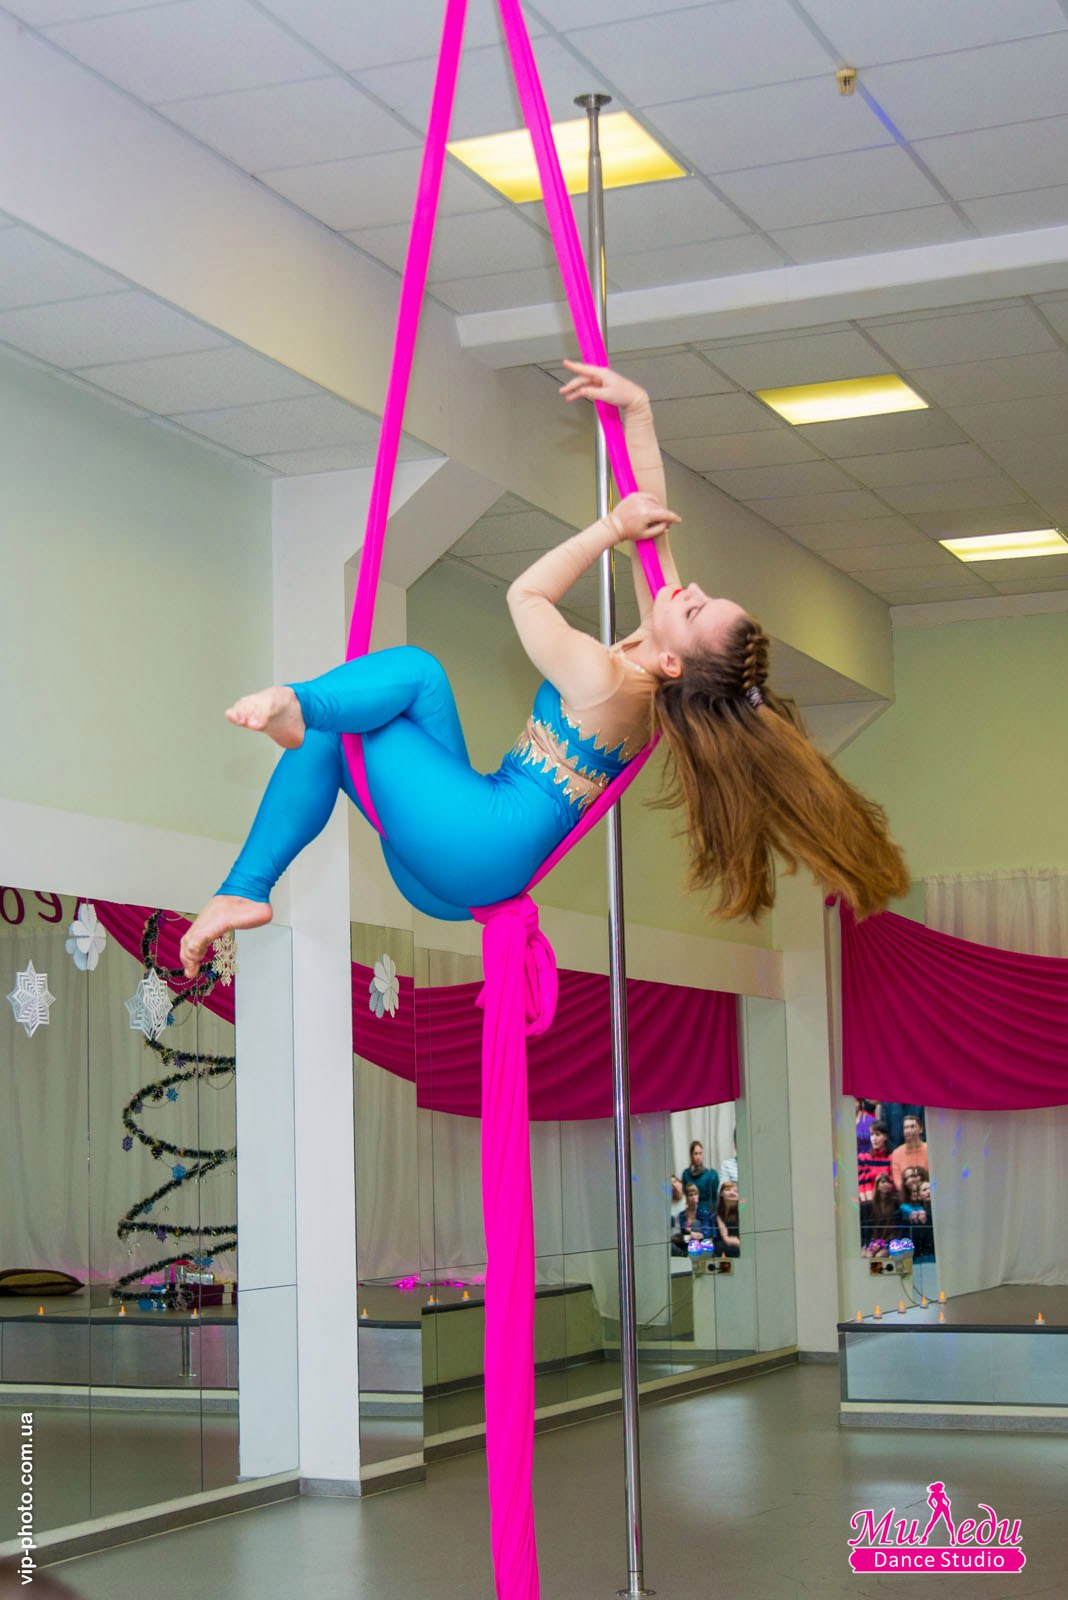 Воздушная гимнастика дети фото